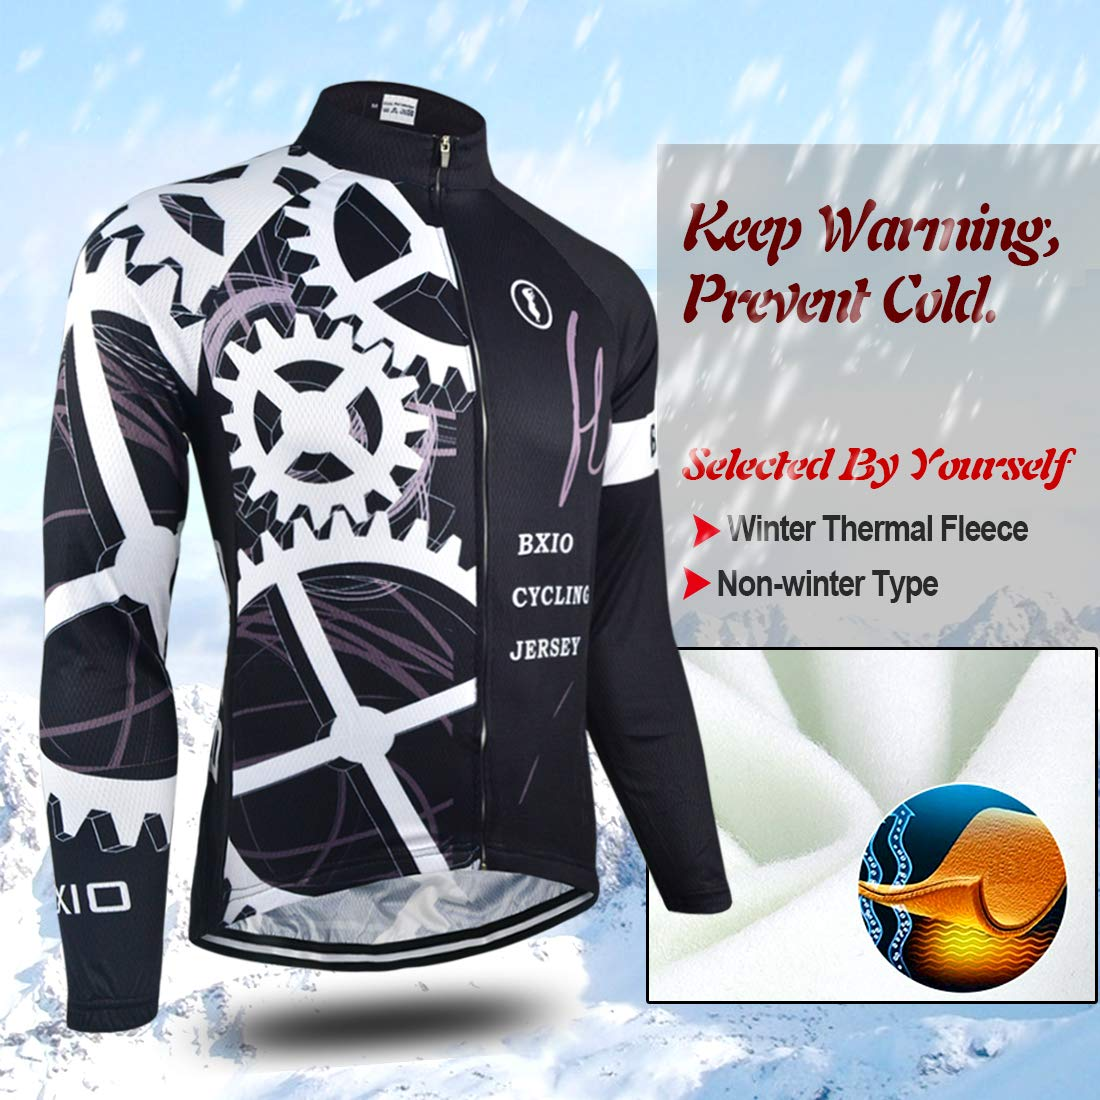 BXIO Winter Radtrikot Pro Racing Fahrradbekleidung Herbst Langarm Radsport Uniformen Mann Sport Jersey 080